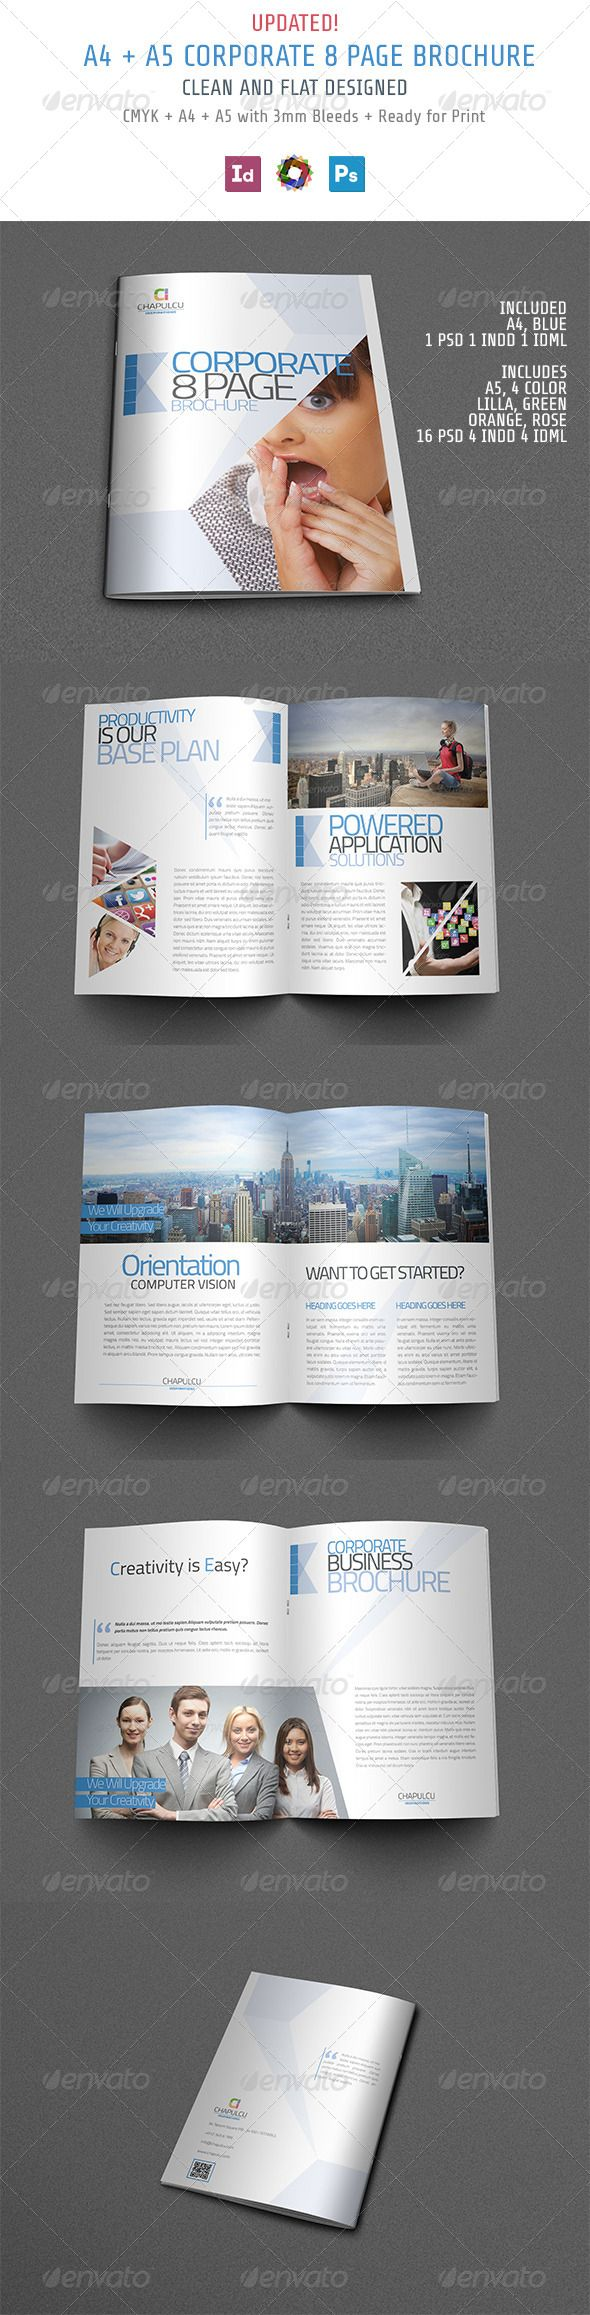 Best Brochure Images On Pinterest Brochures Brochure Design - 8 page brochure template